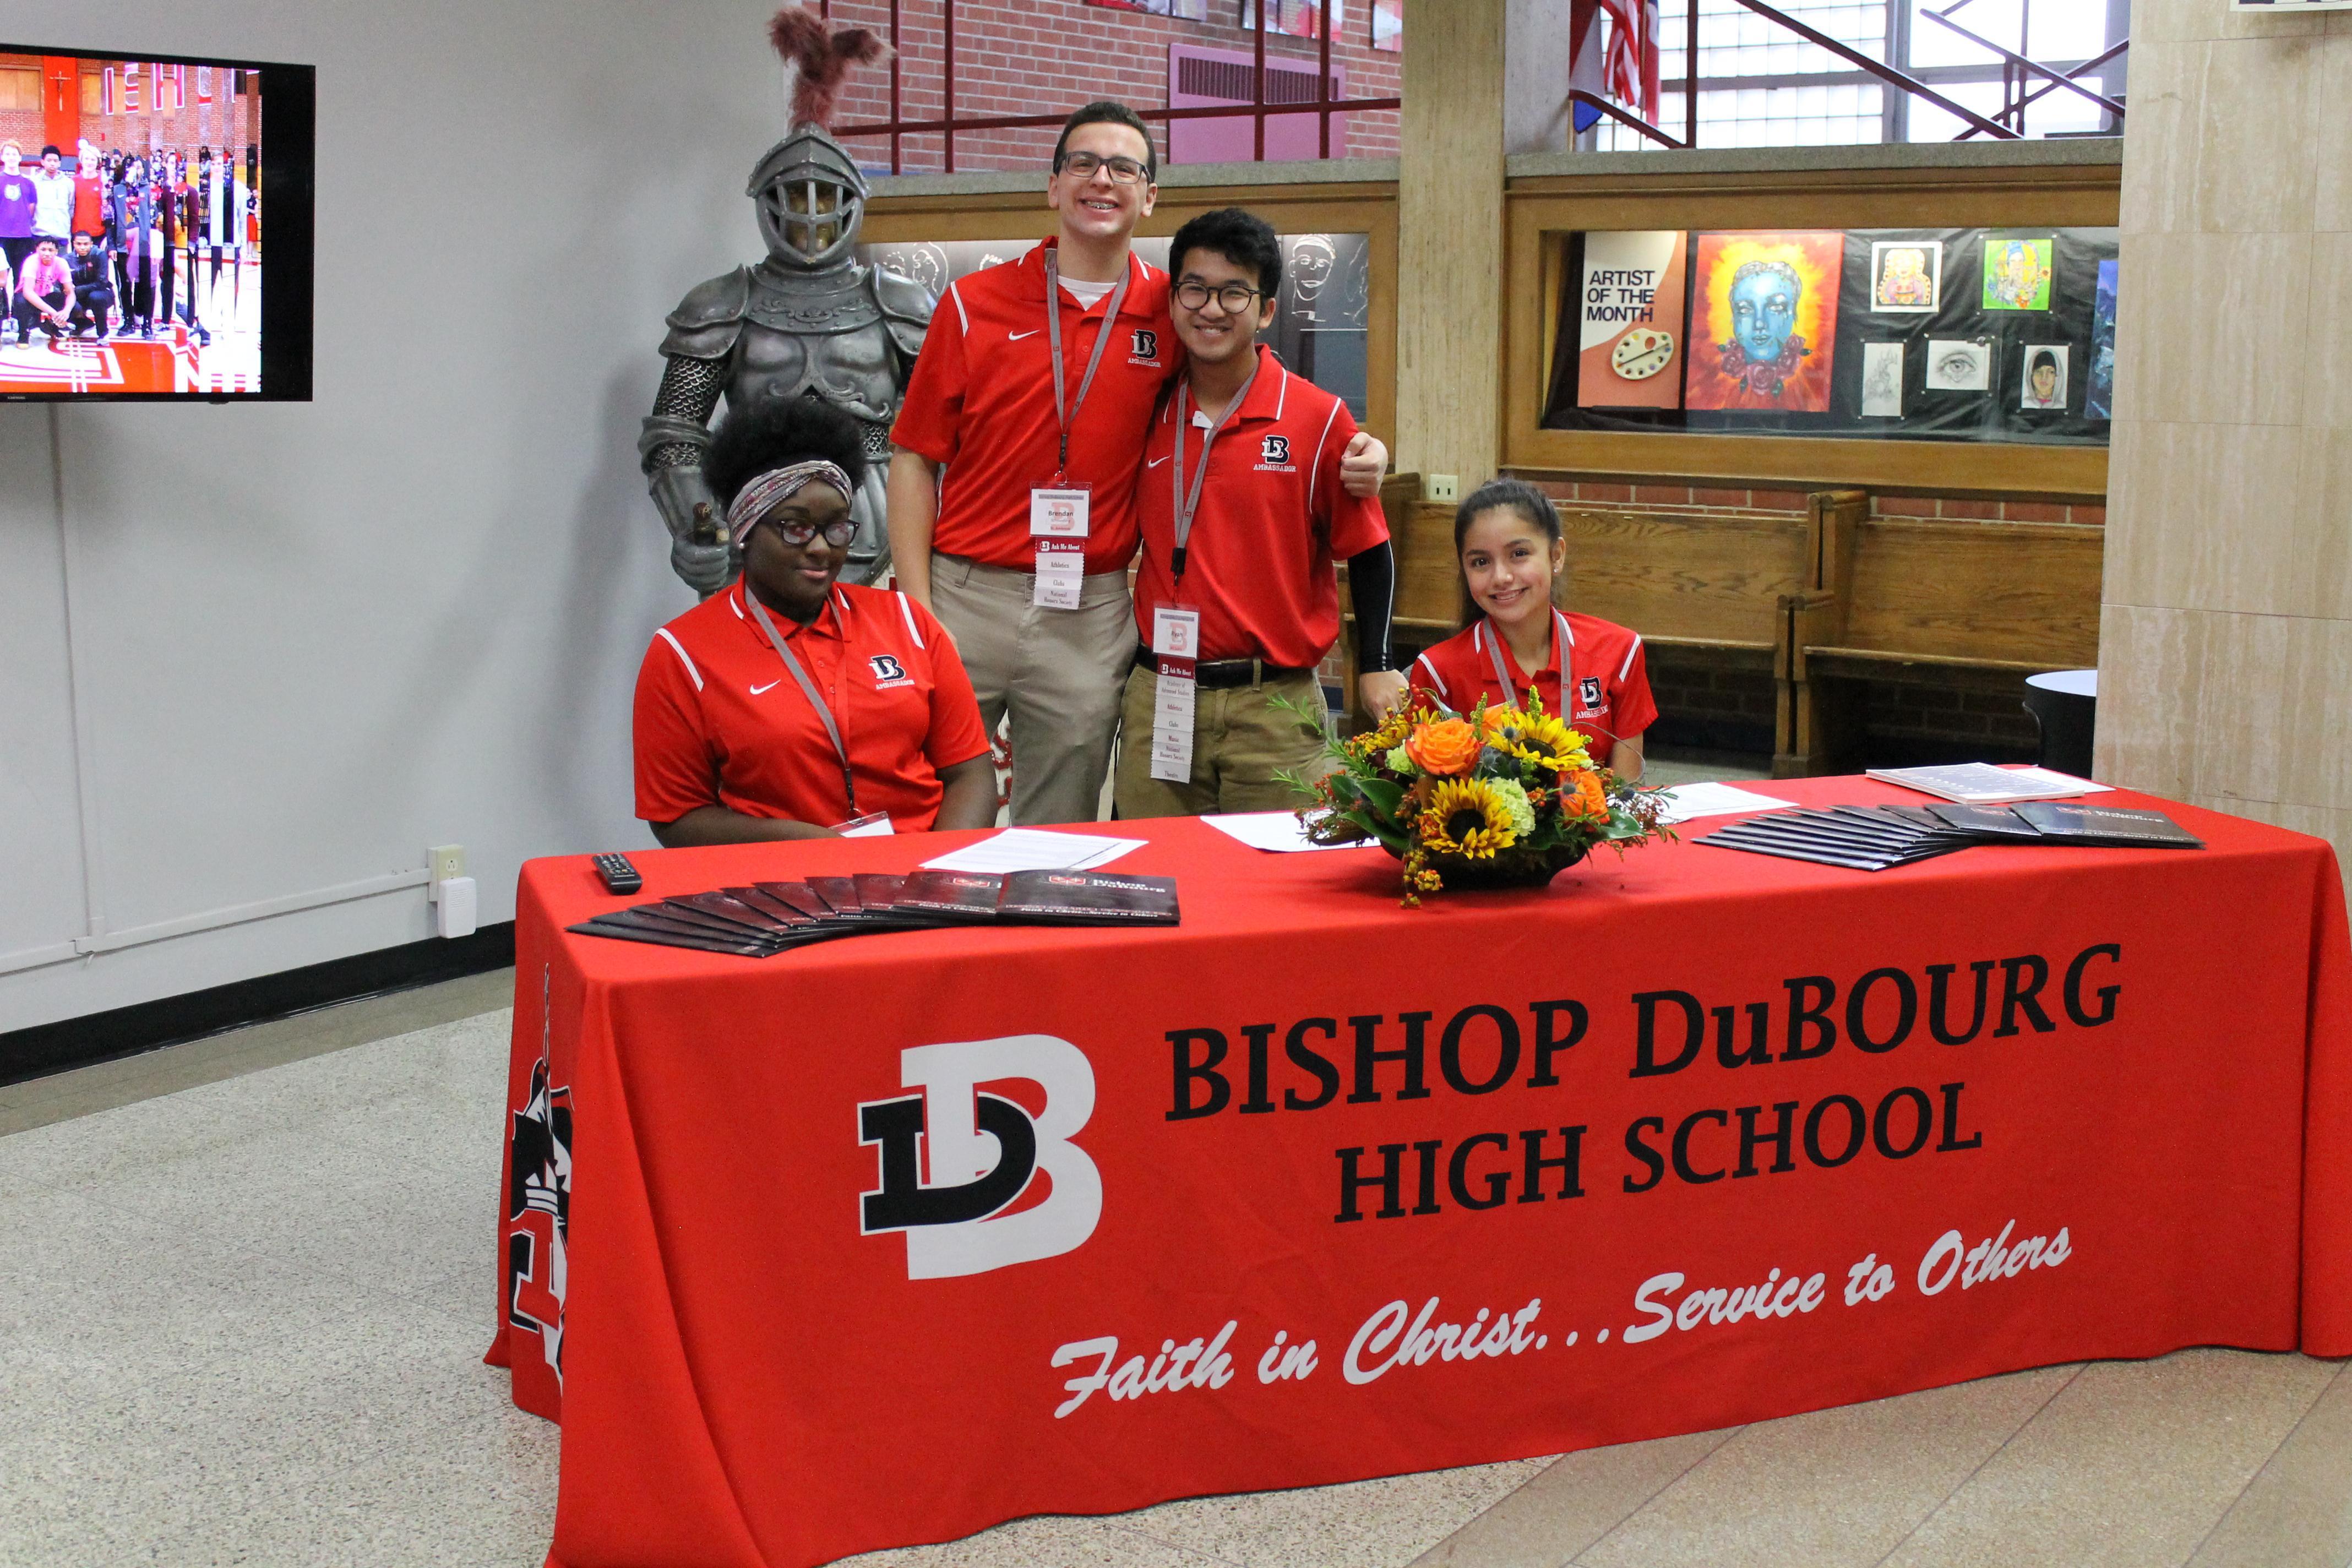 Events | Bishop DuBourg High School